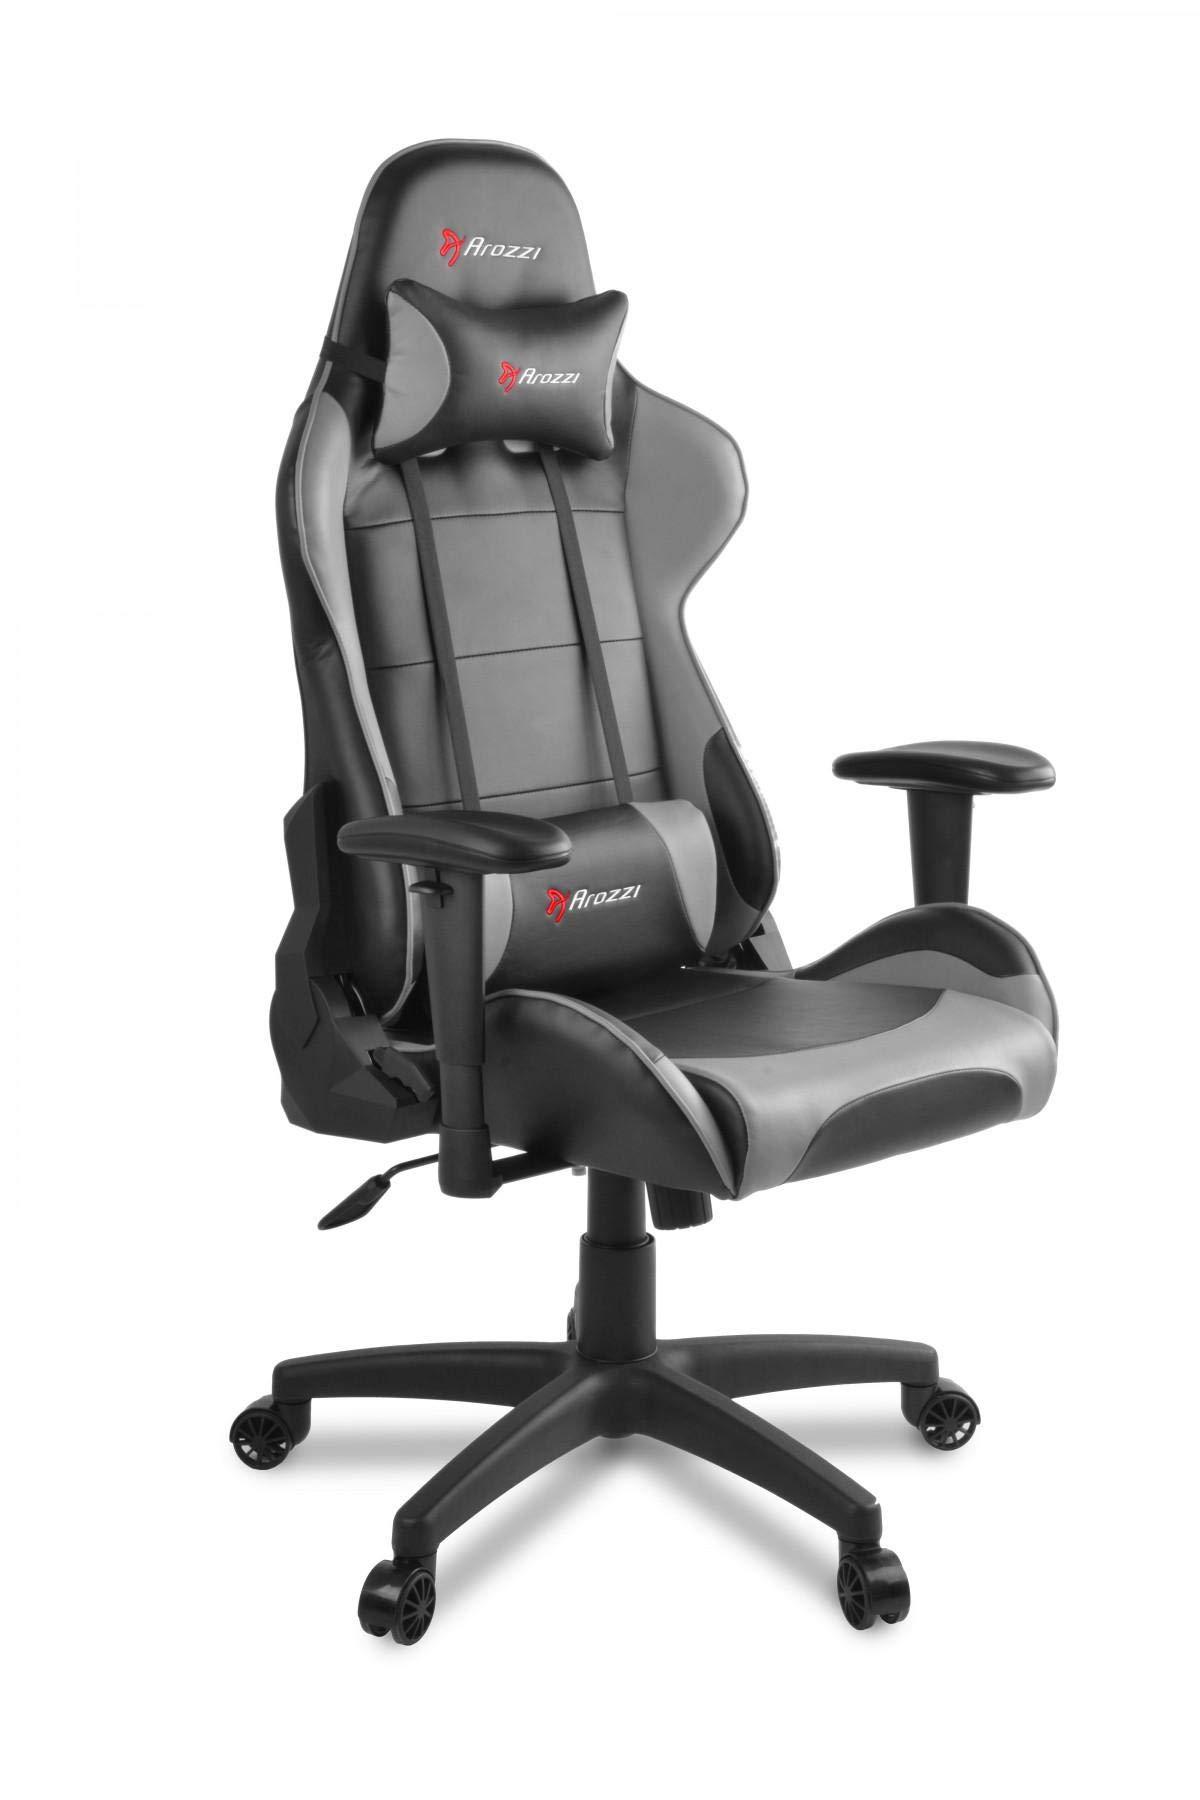 Strange Arozzi Verona V2 Computer Gaming Chair Grey Price In Uae Machost Co Dining Chair Design Ideas Machostcouk